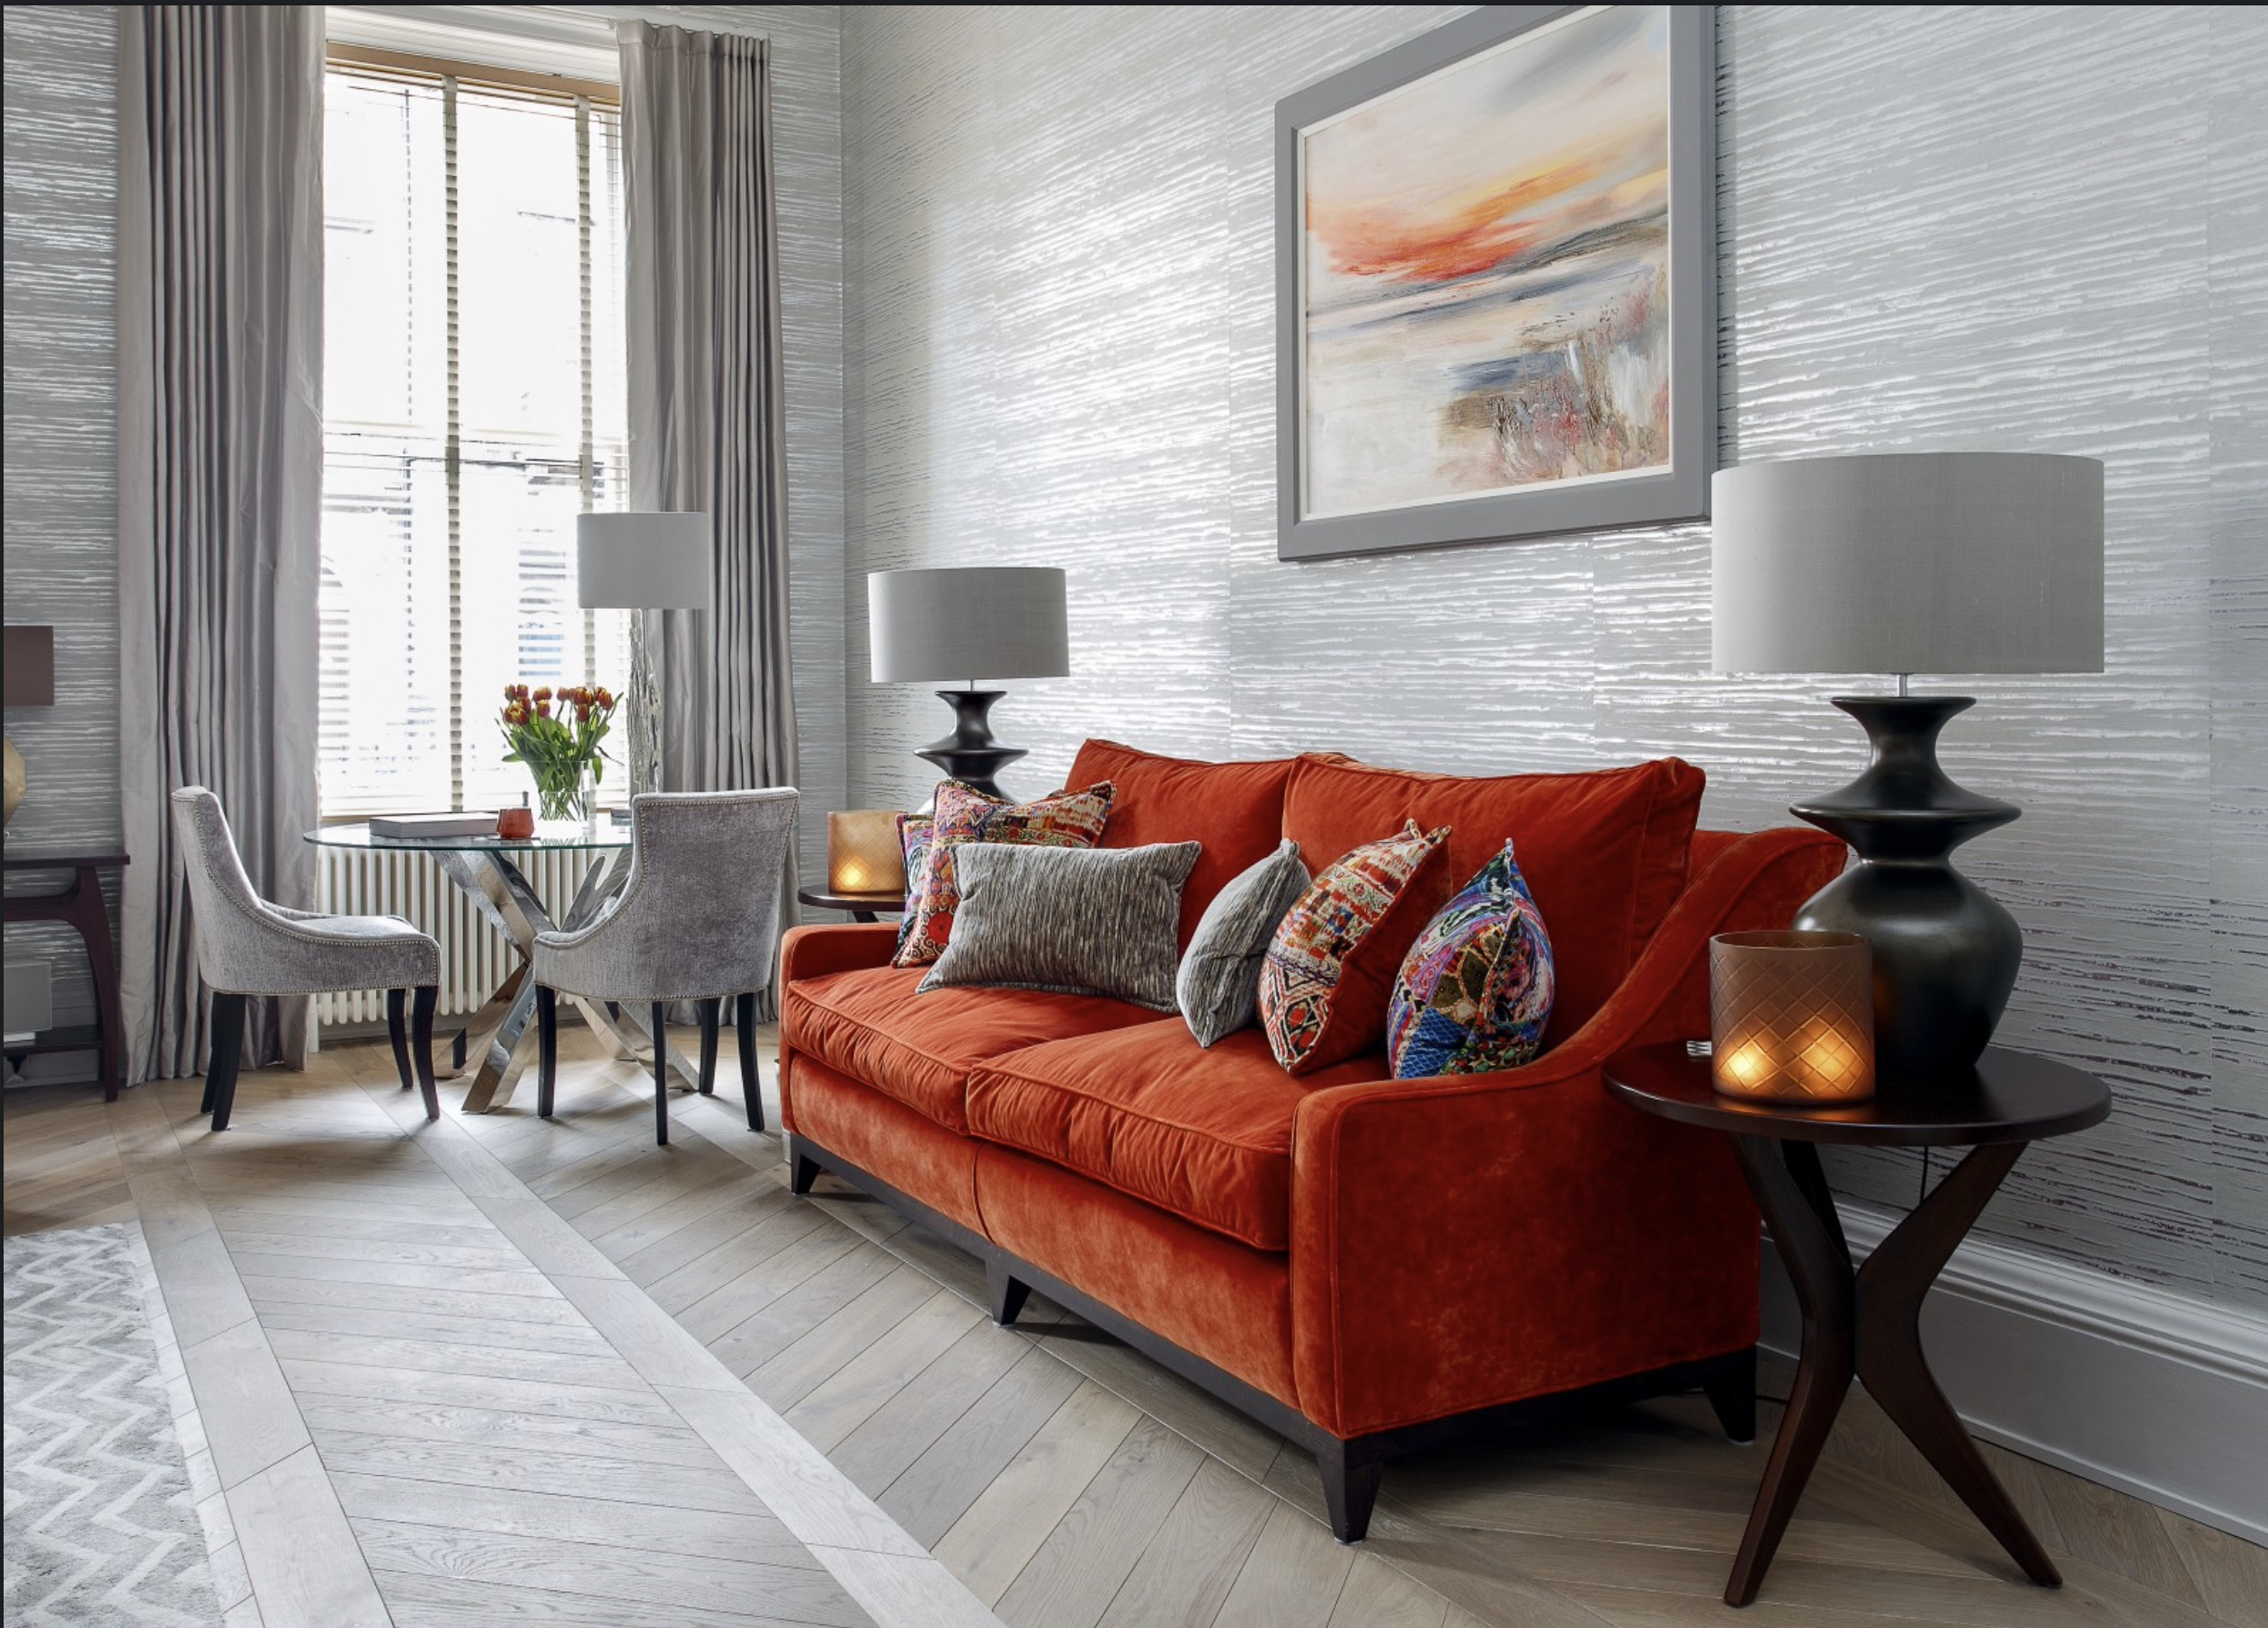 BEAUTIFUL APARTMENT EDINBURGH - Luxe Apartments Rentals